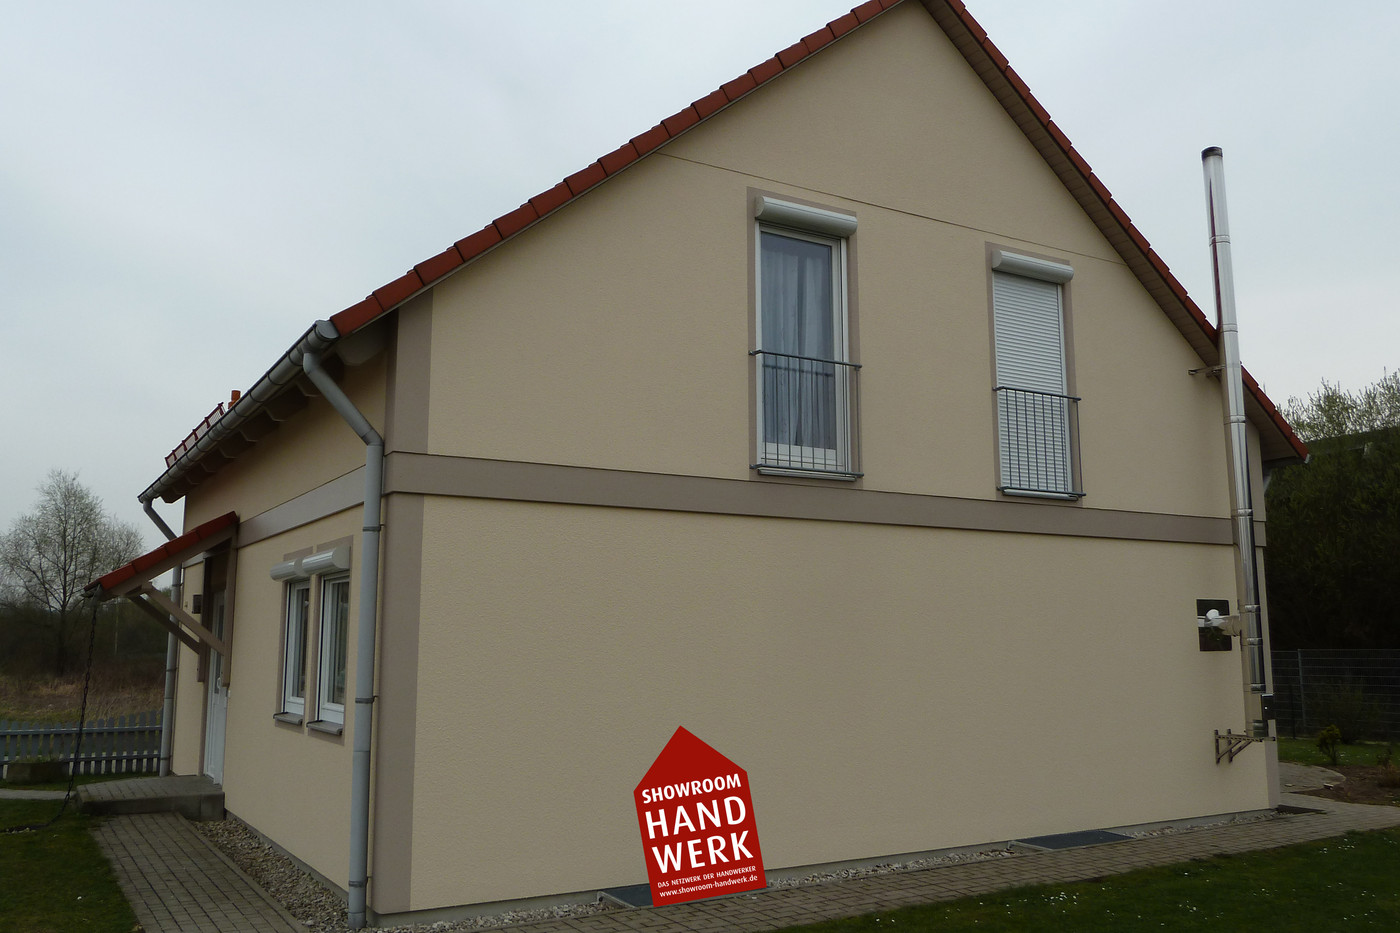 Fassade in Creme-Beige.jpg